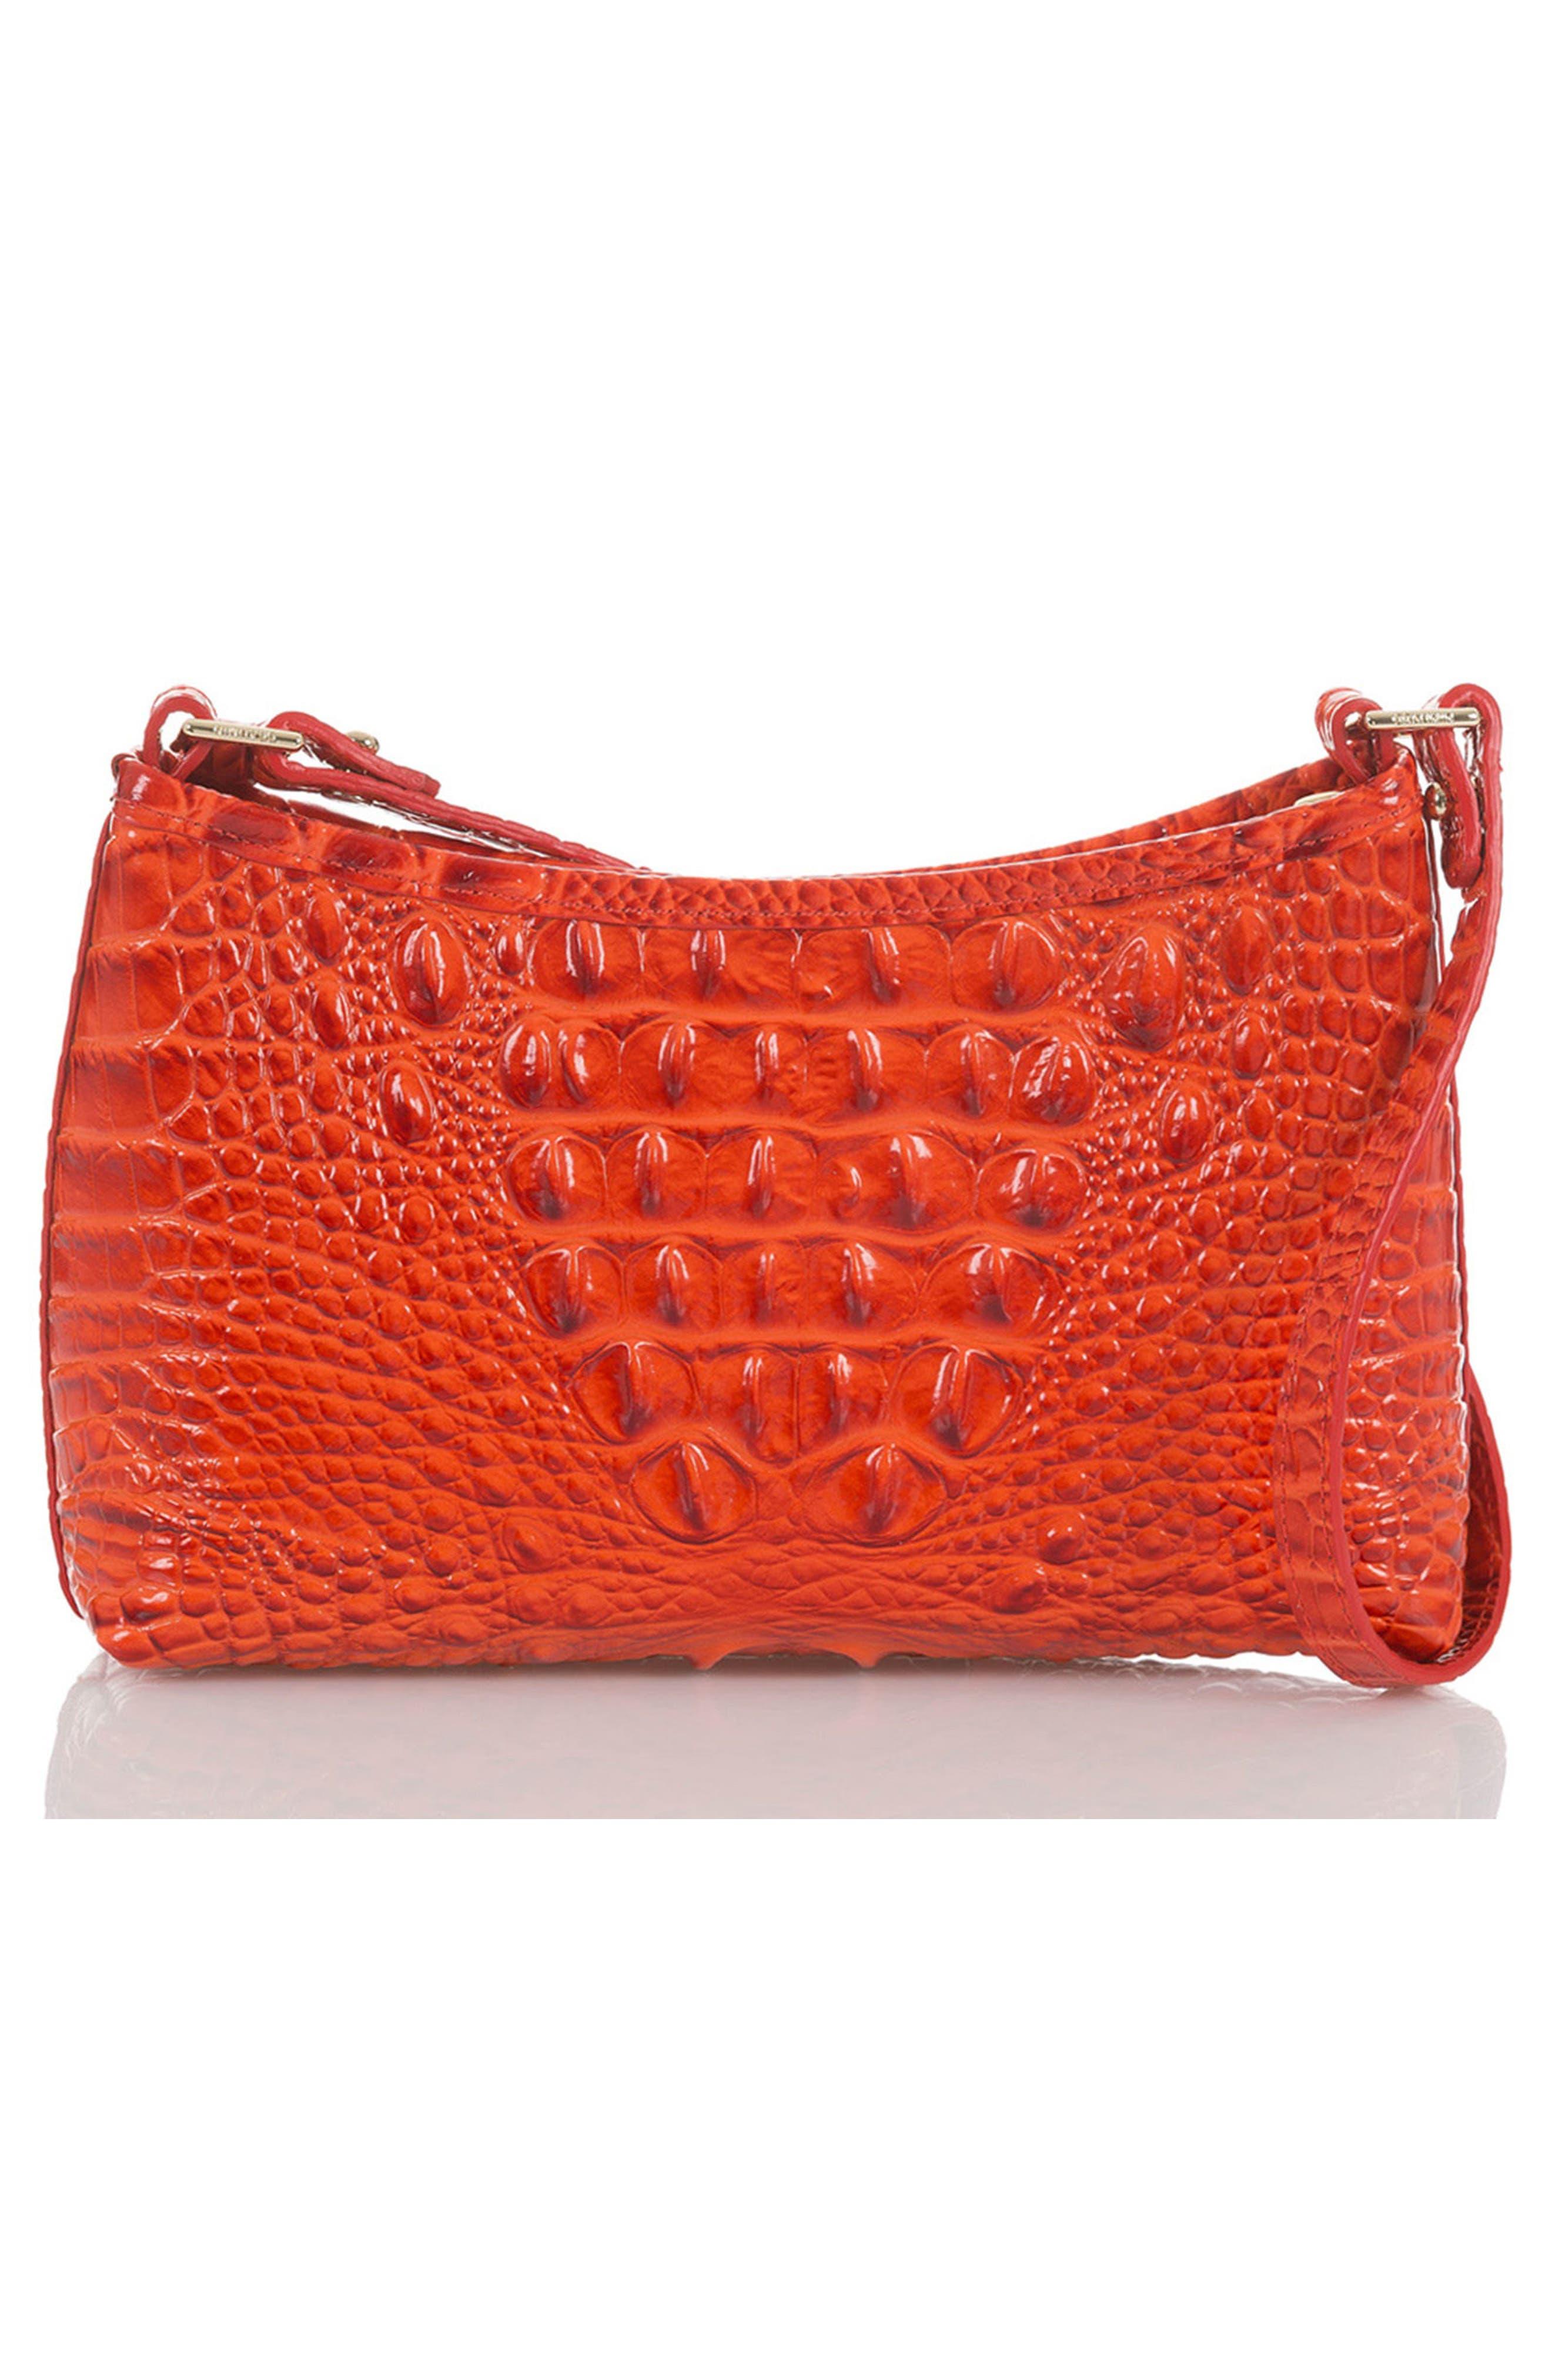 'Anytime - Mini' Convertible Handbag,                             Alternate thumbnail 46, color,